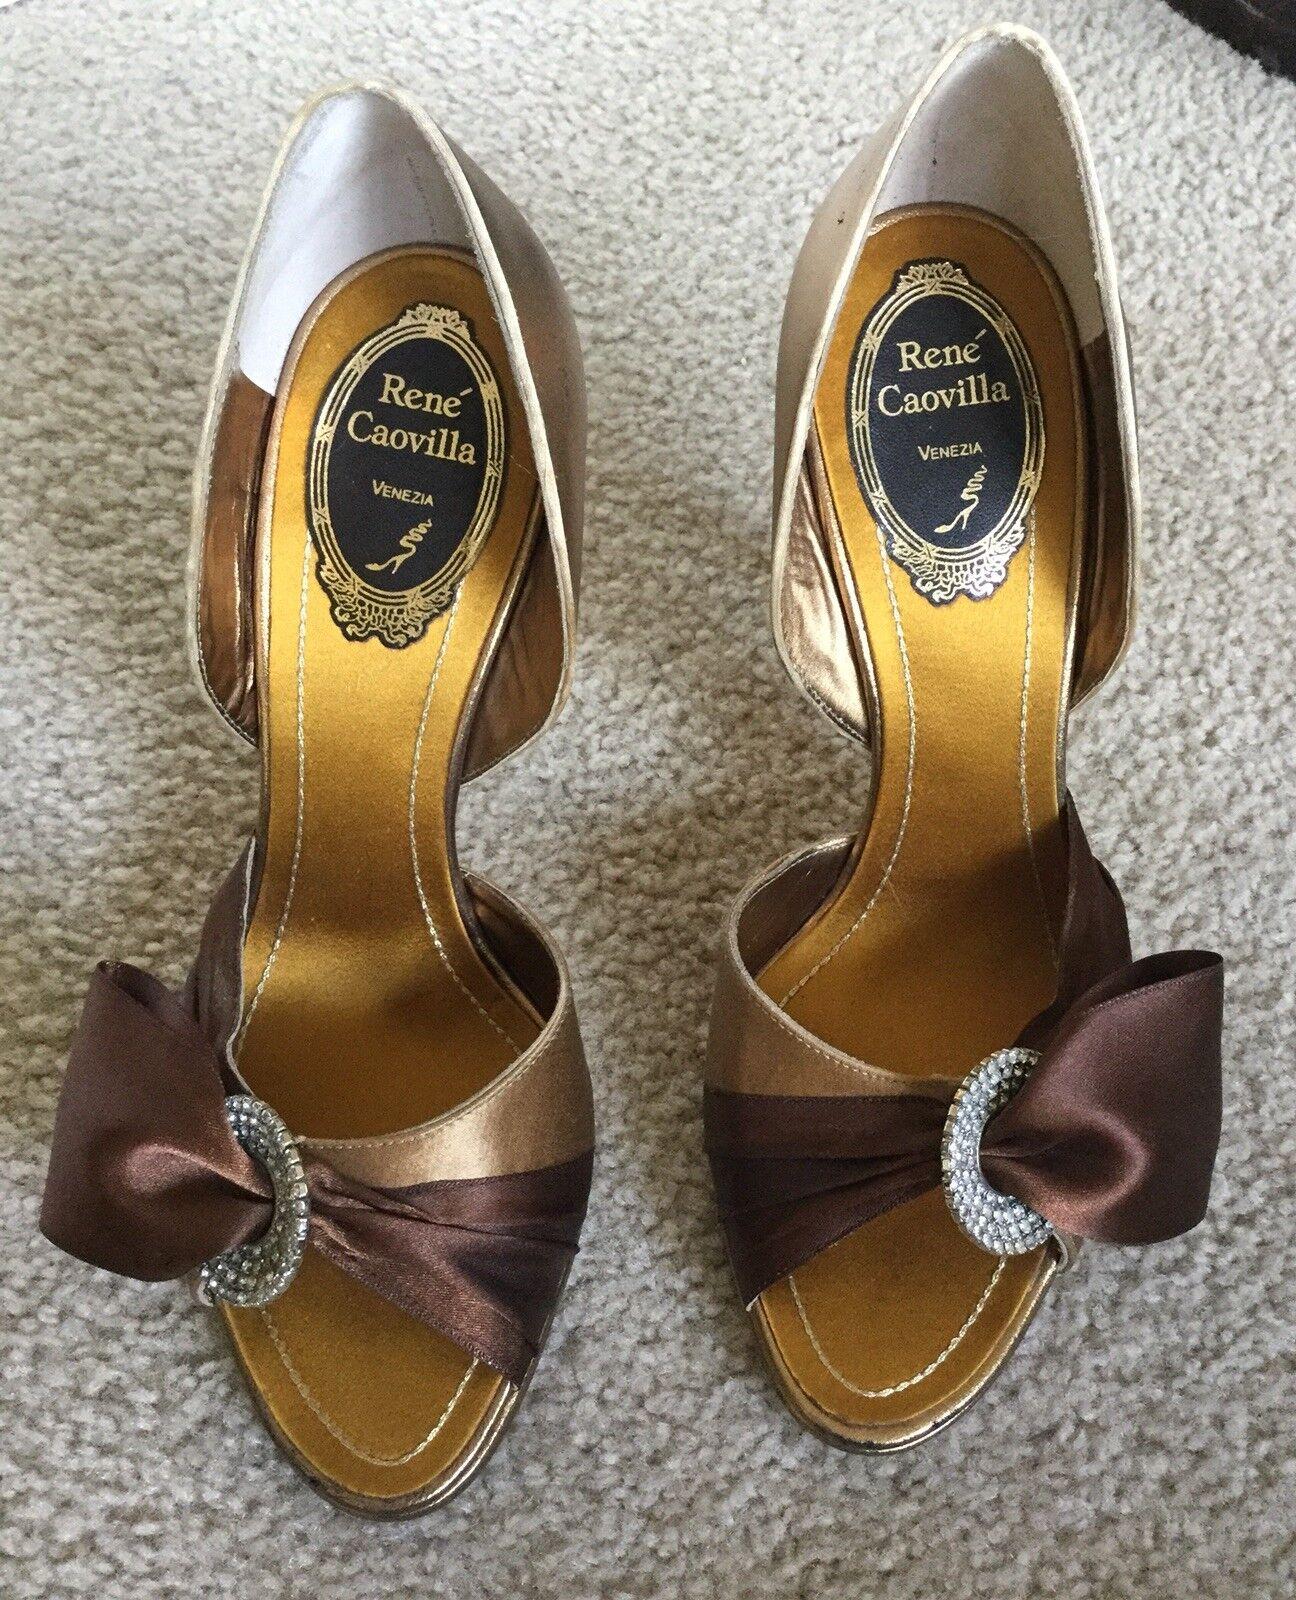 New Rene Caovilla Gold braun Rhinestone D'orsay Pump Heel schuhe 37.5